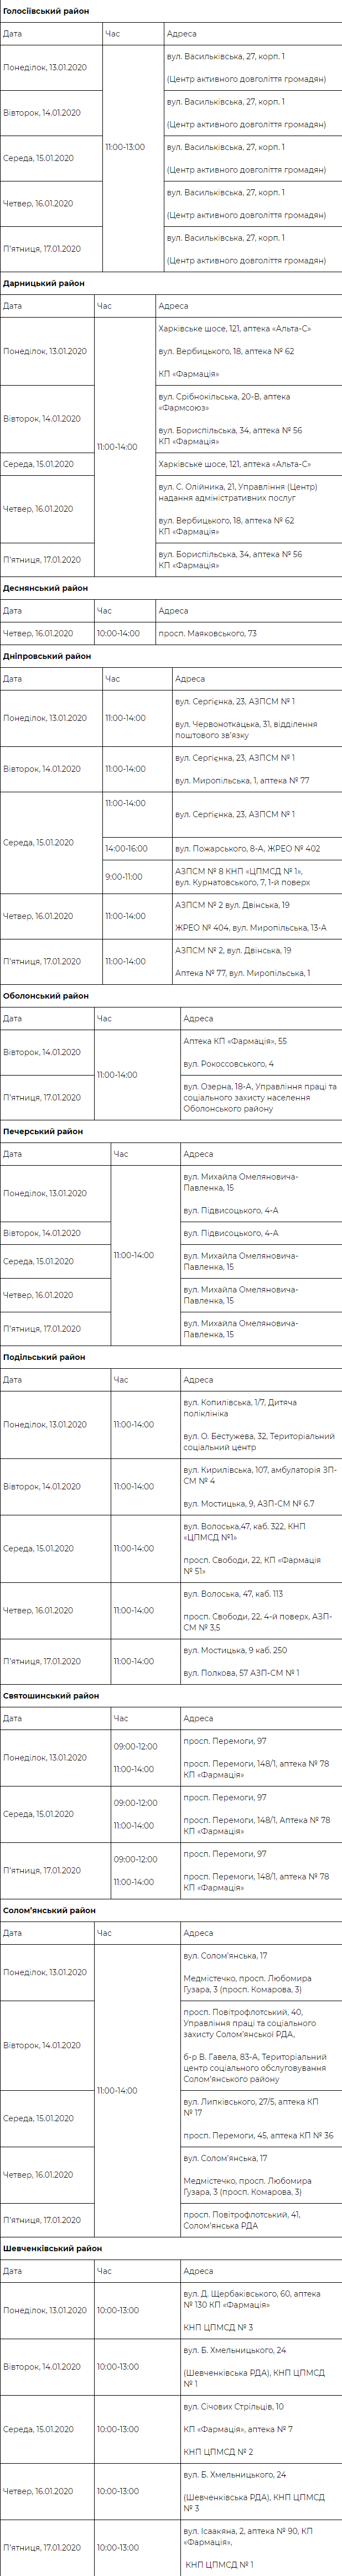 Дата и время приема пациентов по разным районам